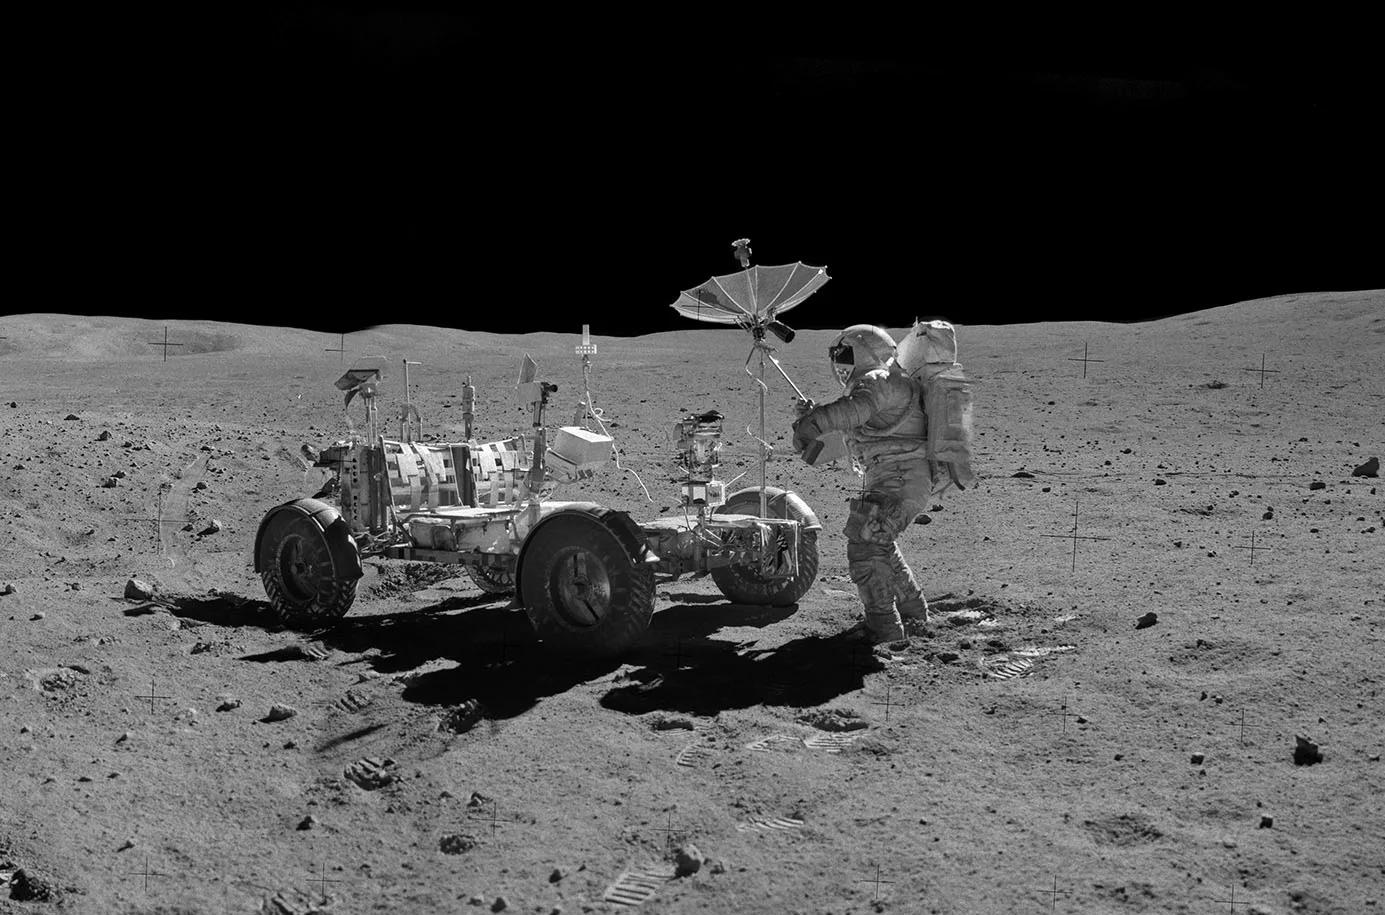 «Лунный багги» из состава «Аполлон-16» на Луне